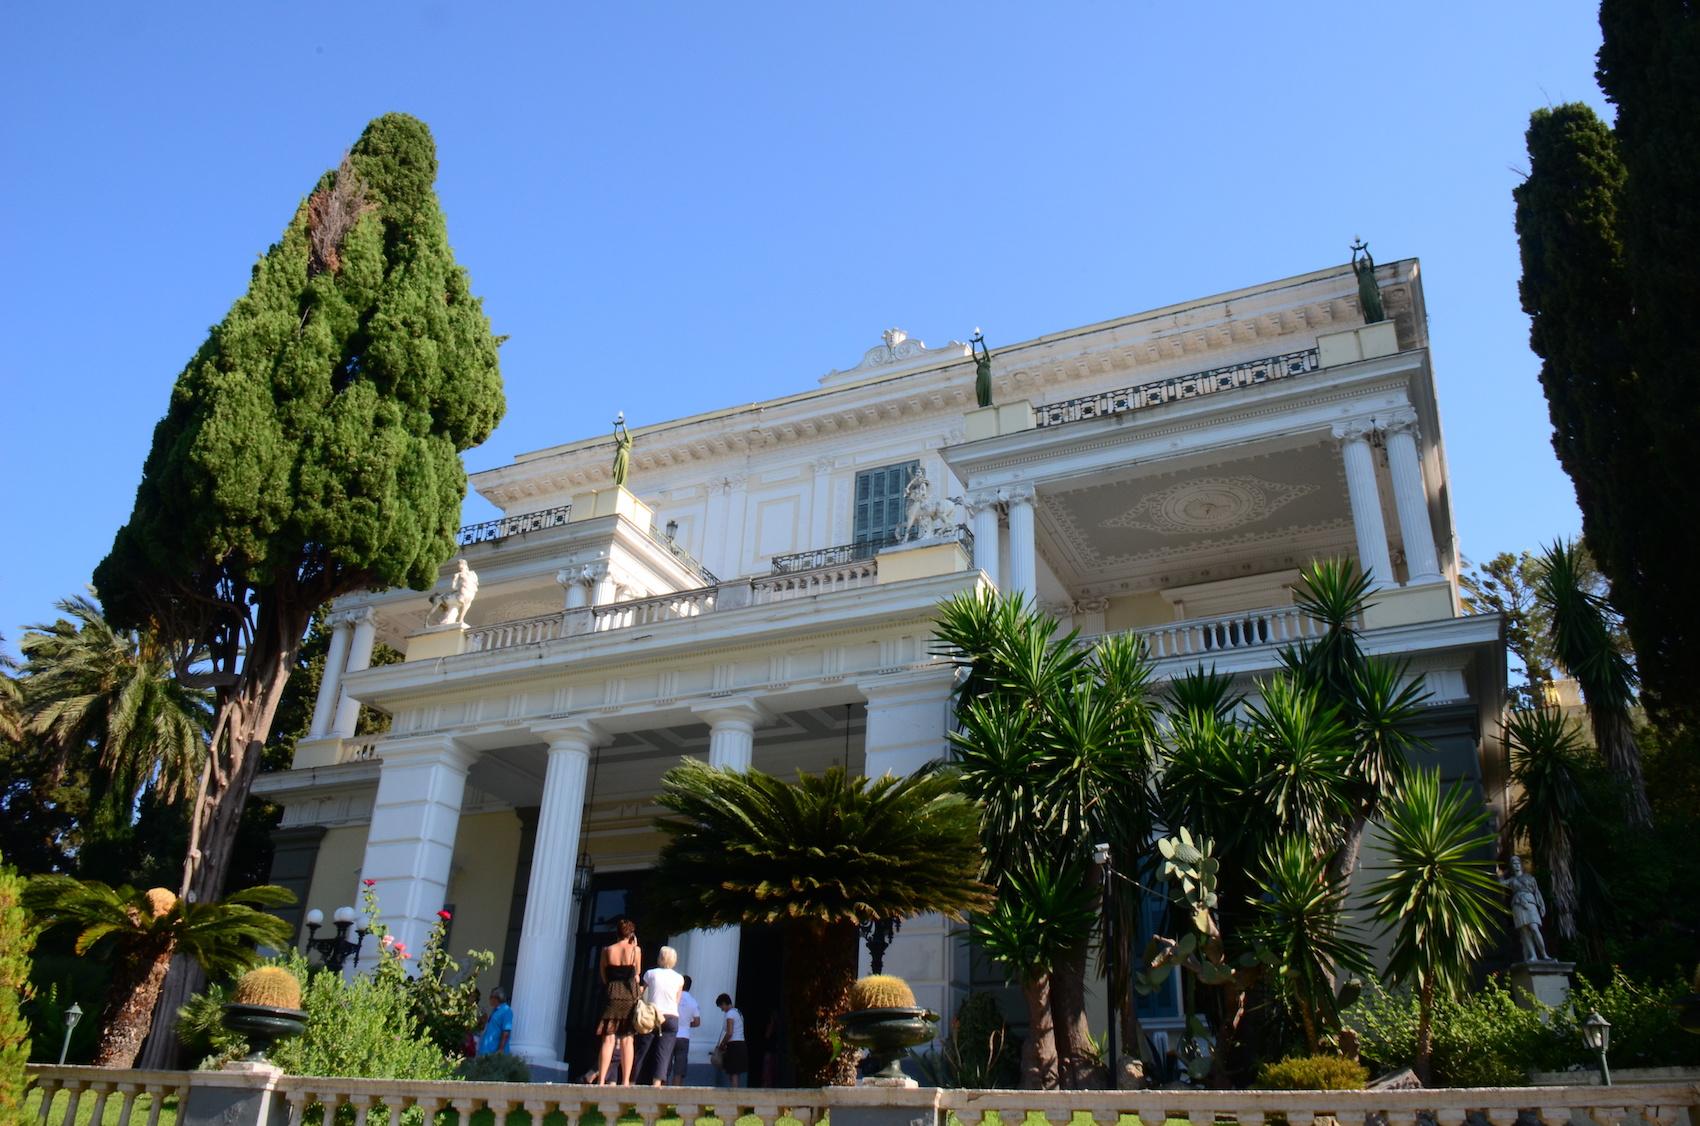 Achilleion, Corfu, Greece : Achilleion Palace roof